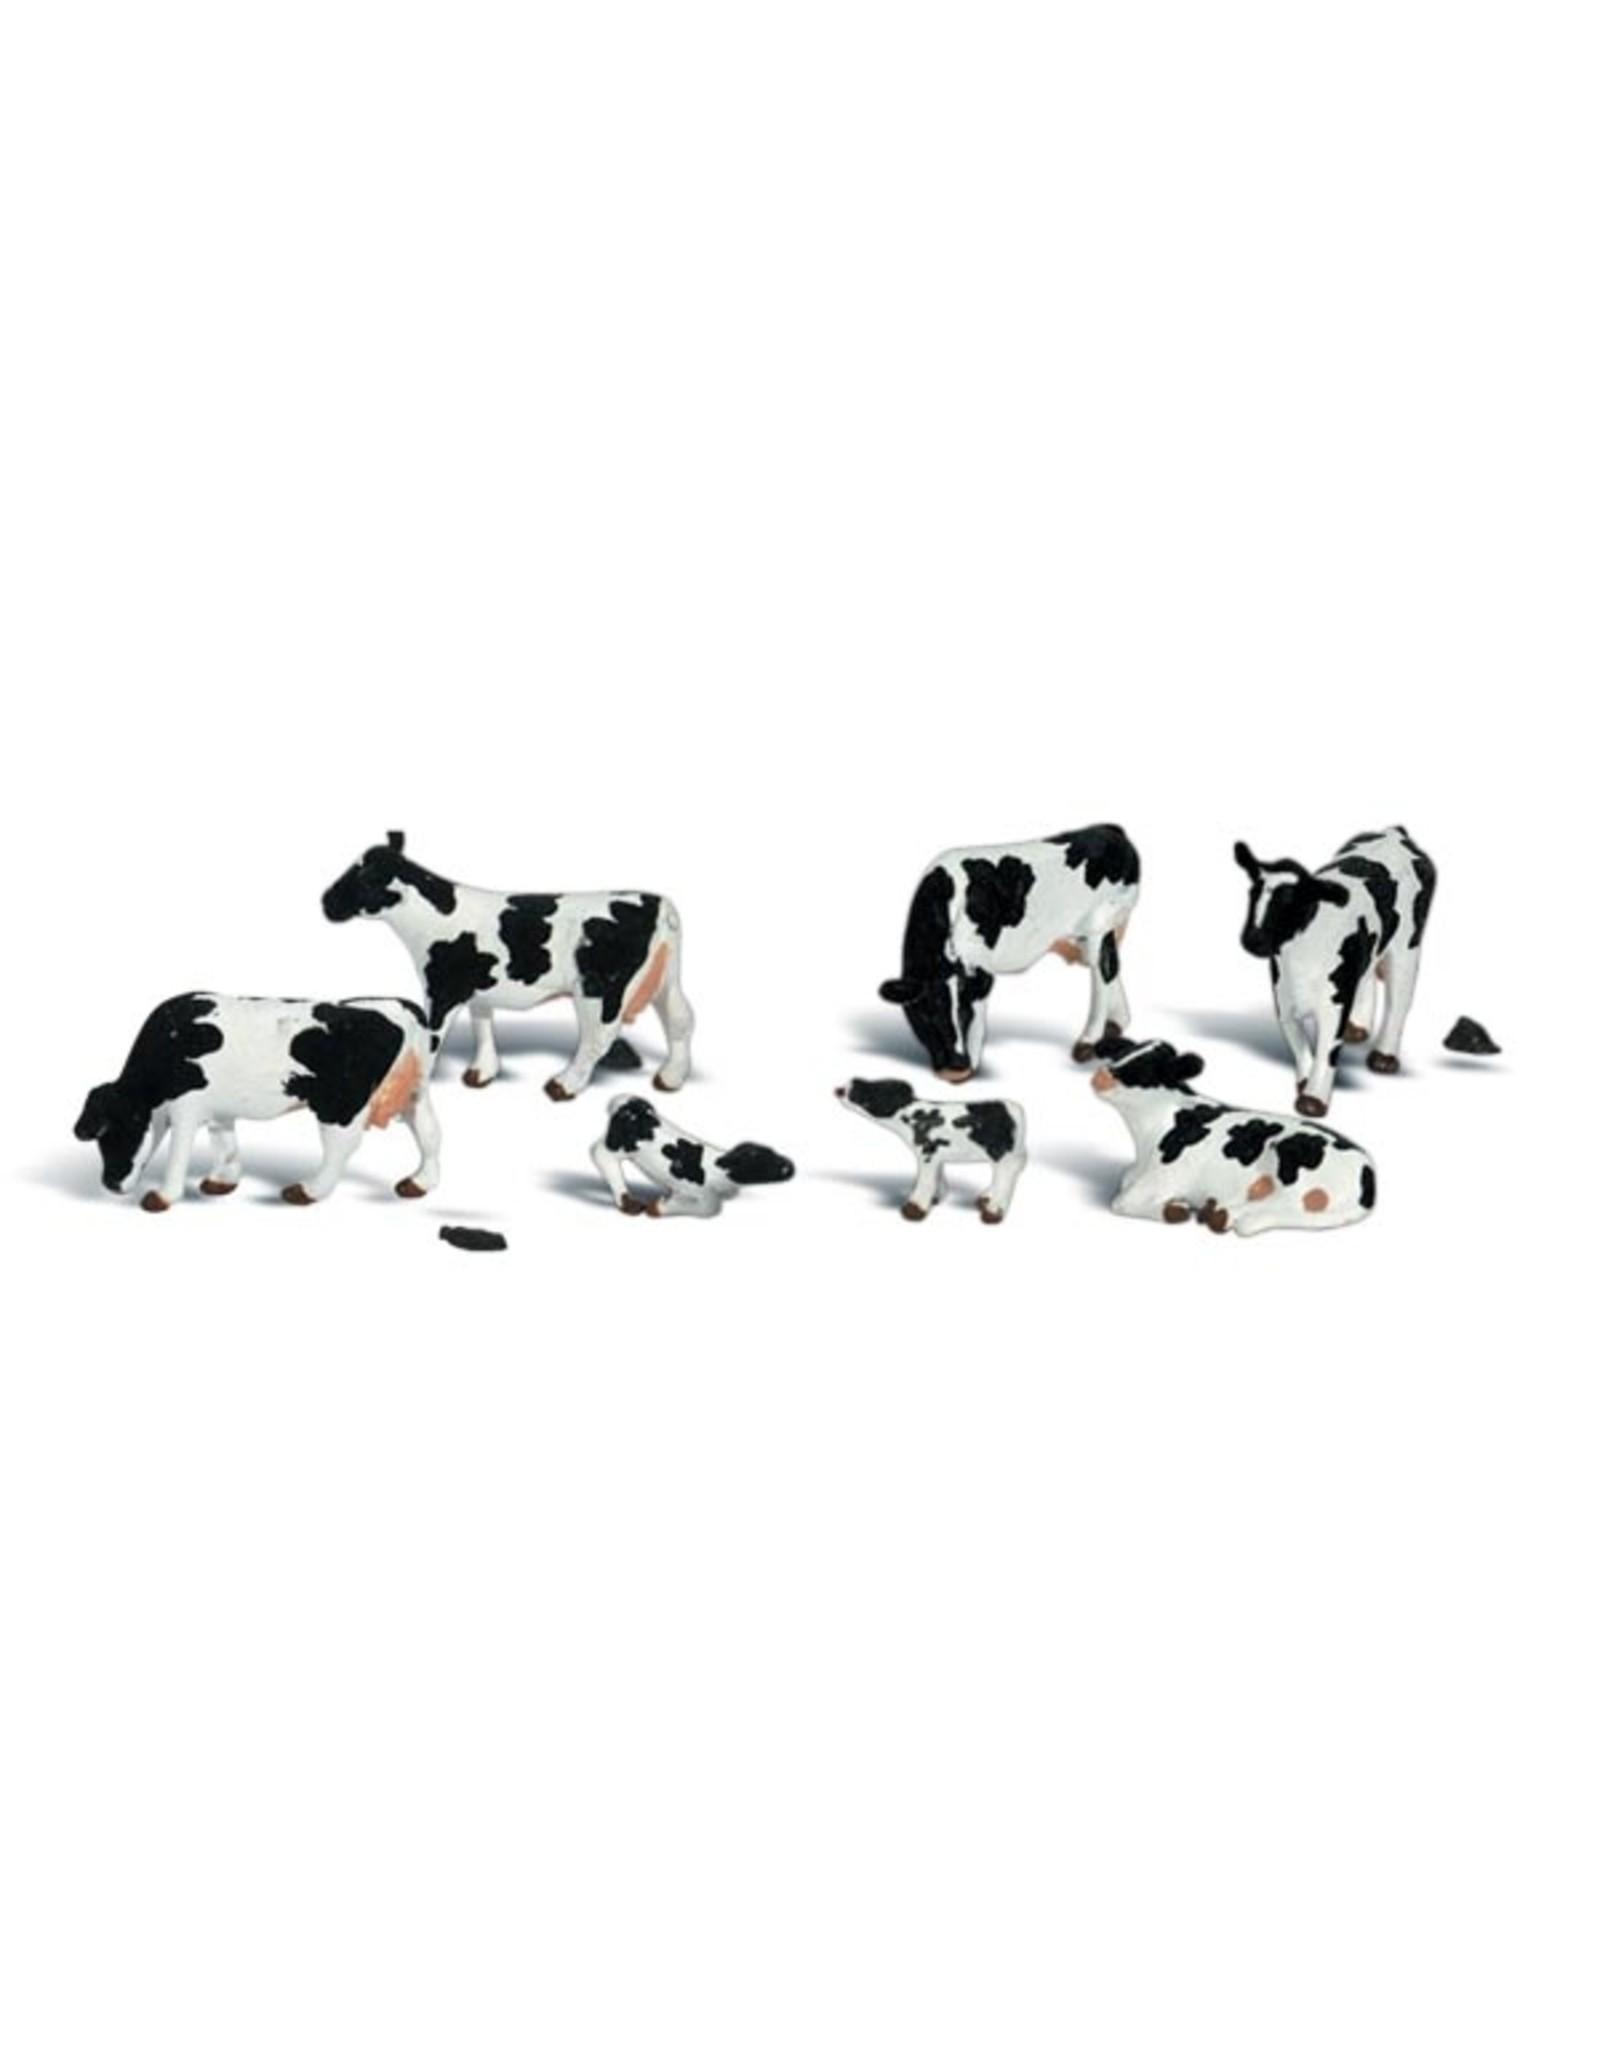 Woodland Scenics Holstein Cows HO 1863